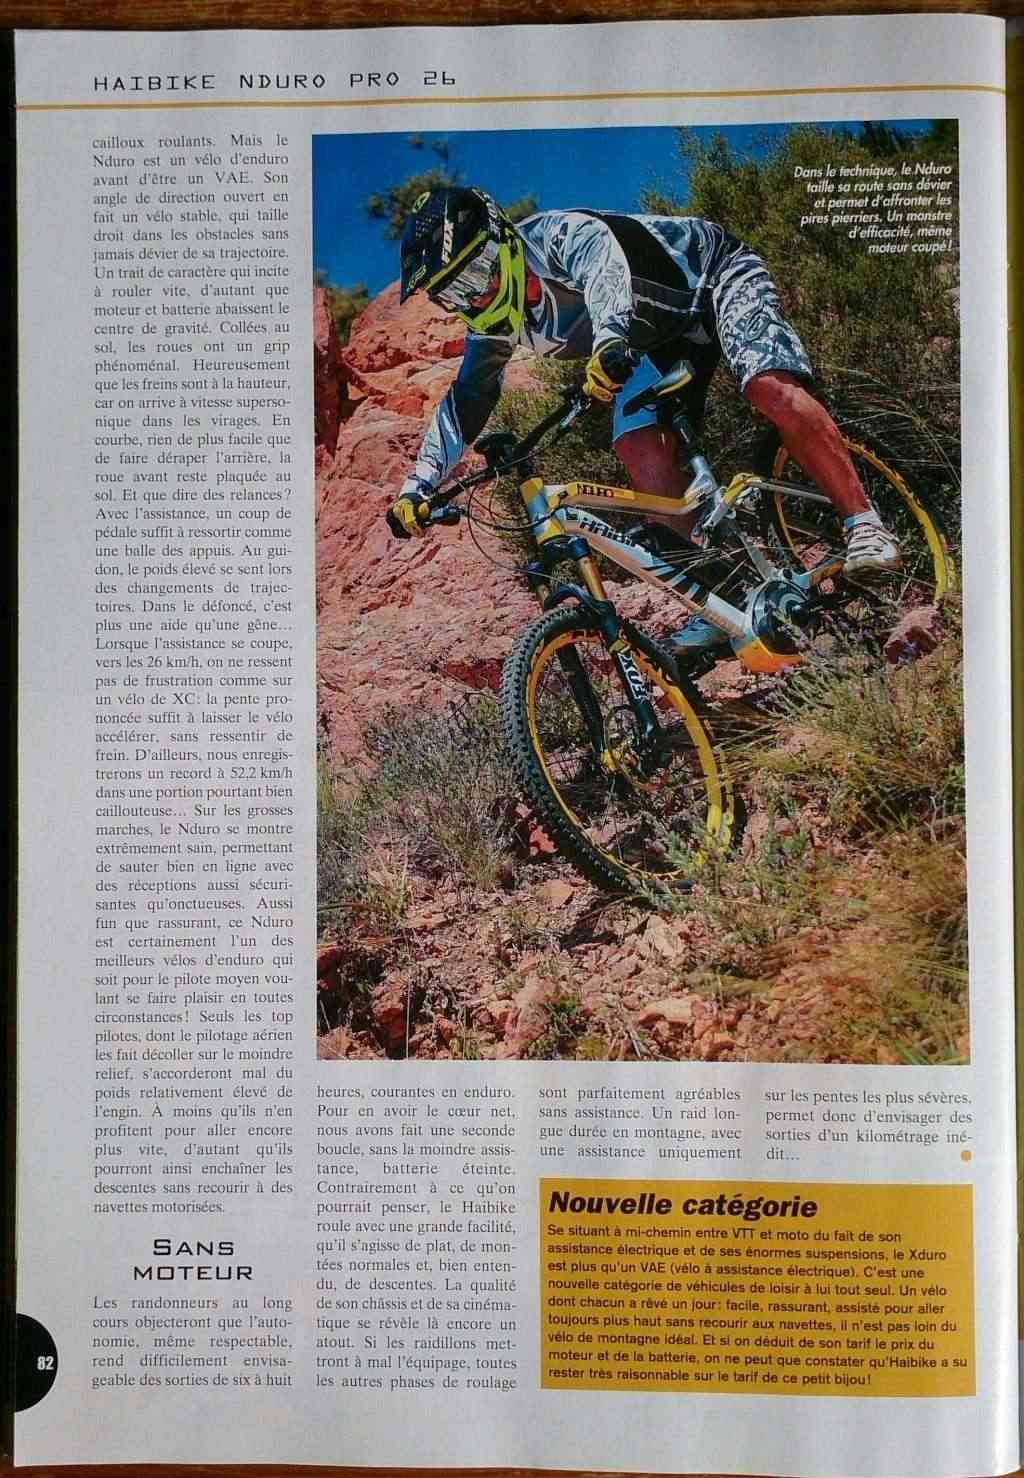 [Luidji76] Mon nouveau bike: VAE Haibike XDURO NDURO RX 26 - Page 2 Dsc_0112